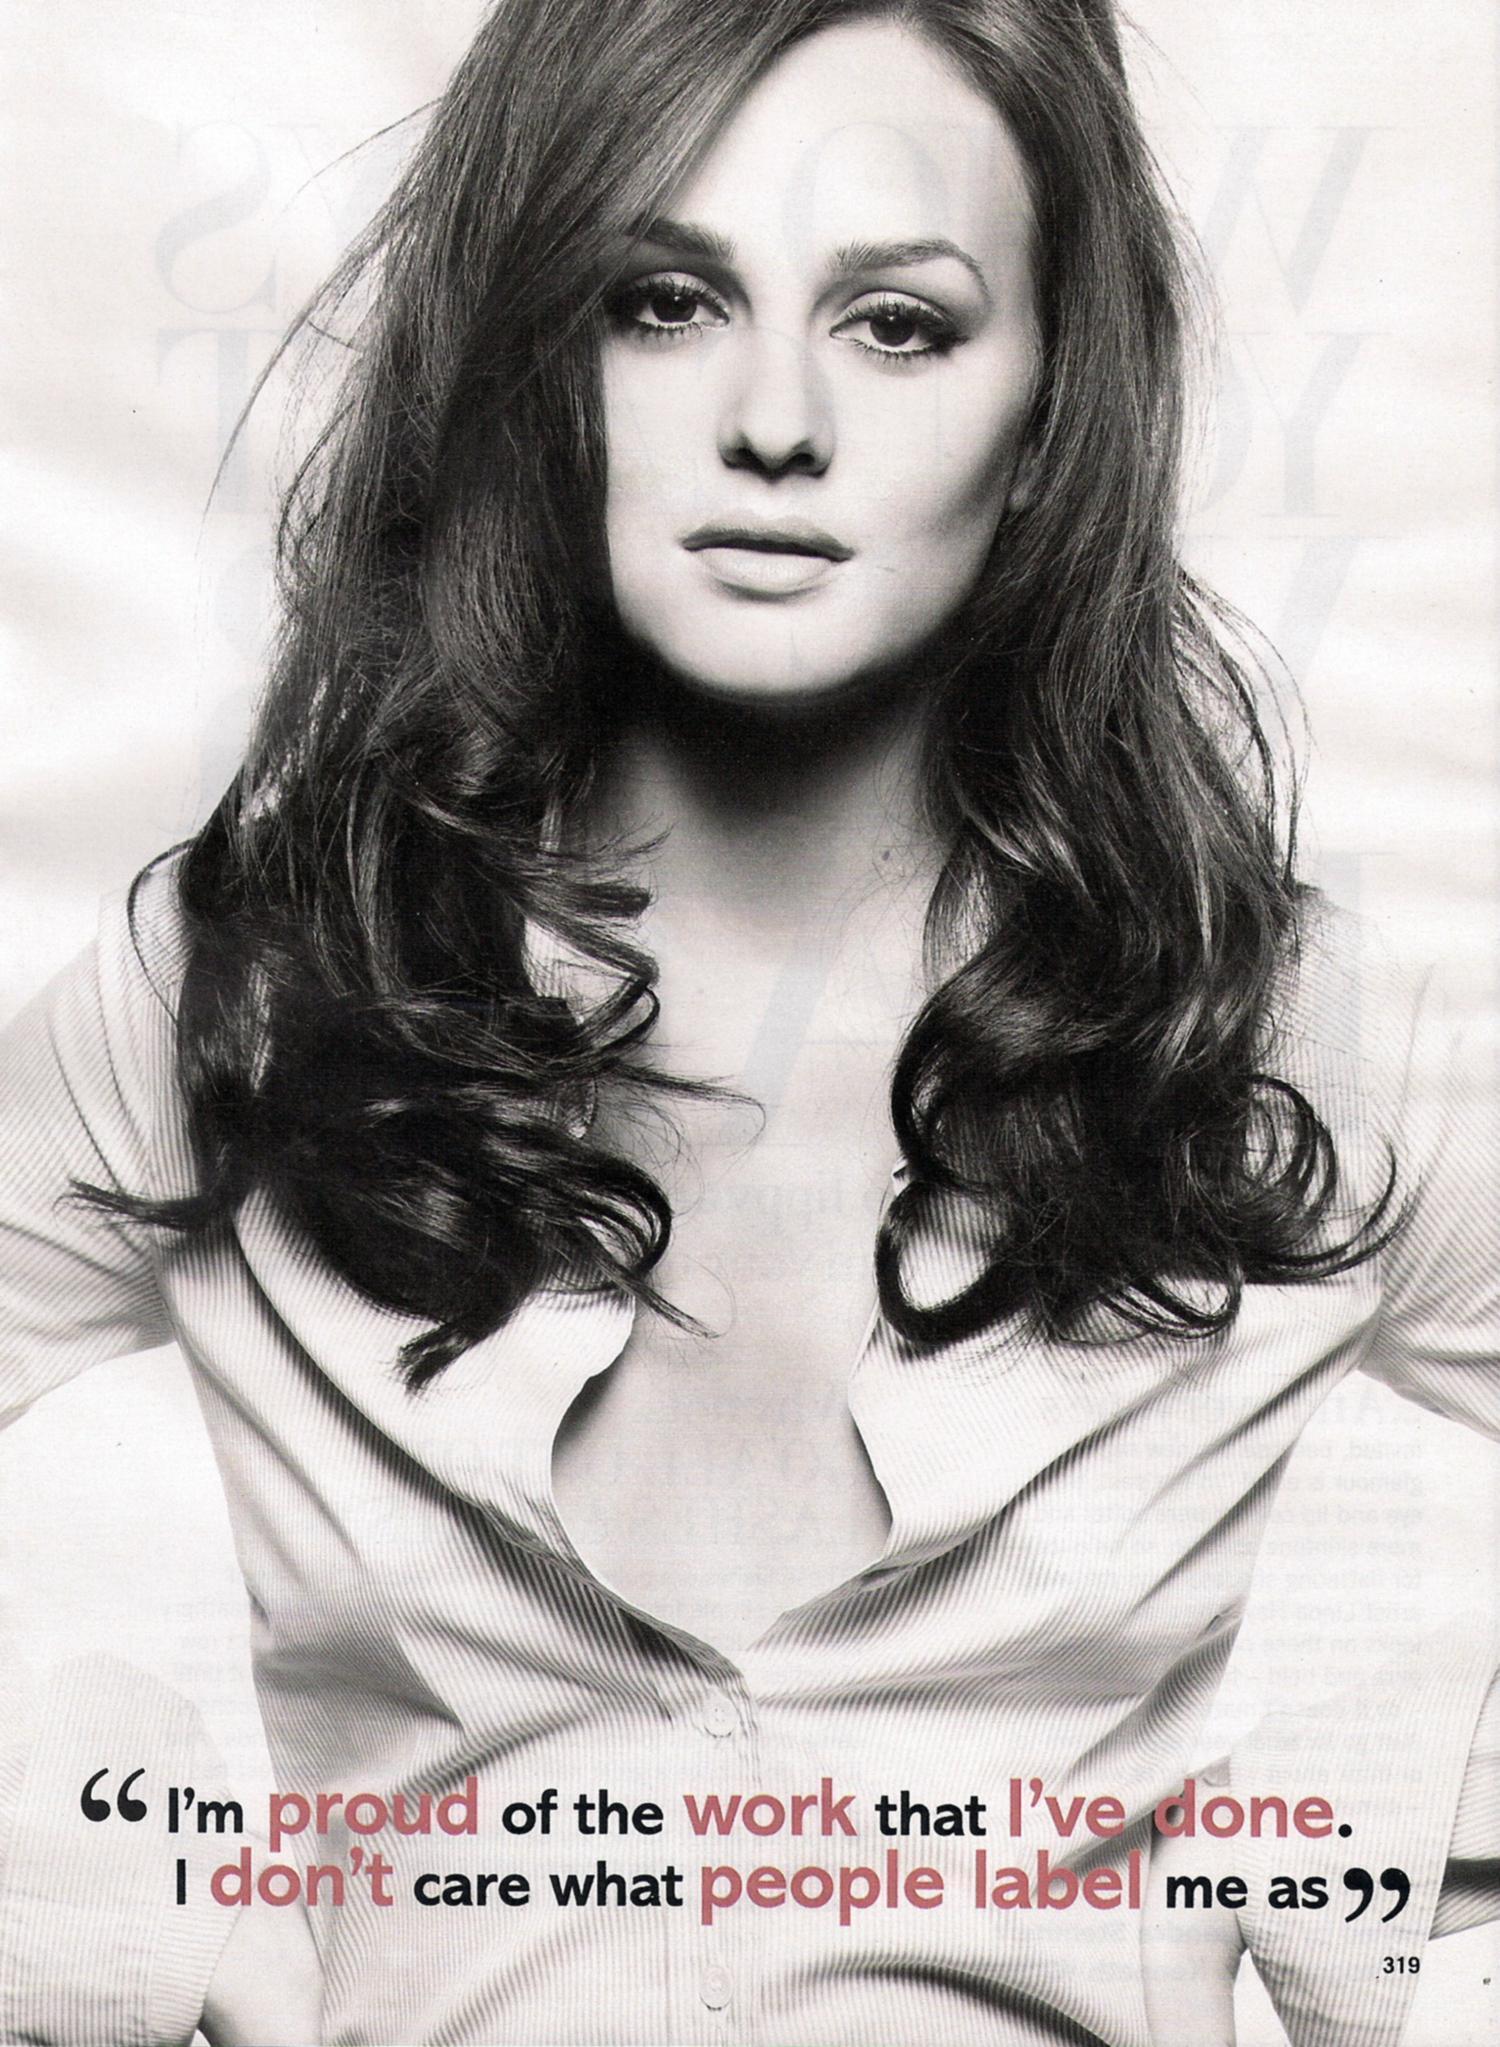 http://images2.fanpop.com/image/photos/8900000/-LEIGHTON-MEESTER-Glamour-UK-Dec-2009-leighton-meester-8954385-1500-2047.jpg